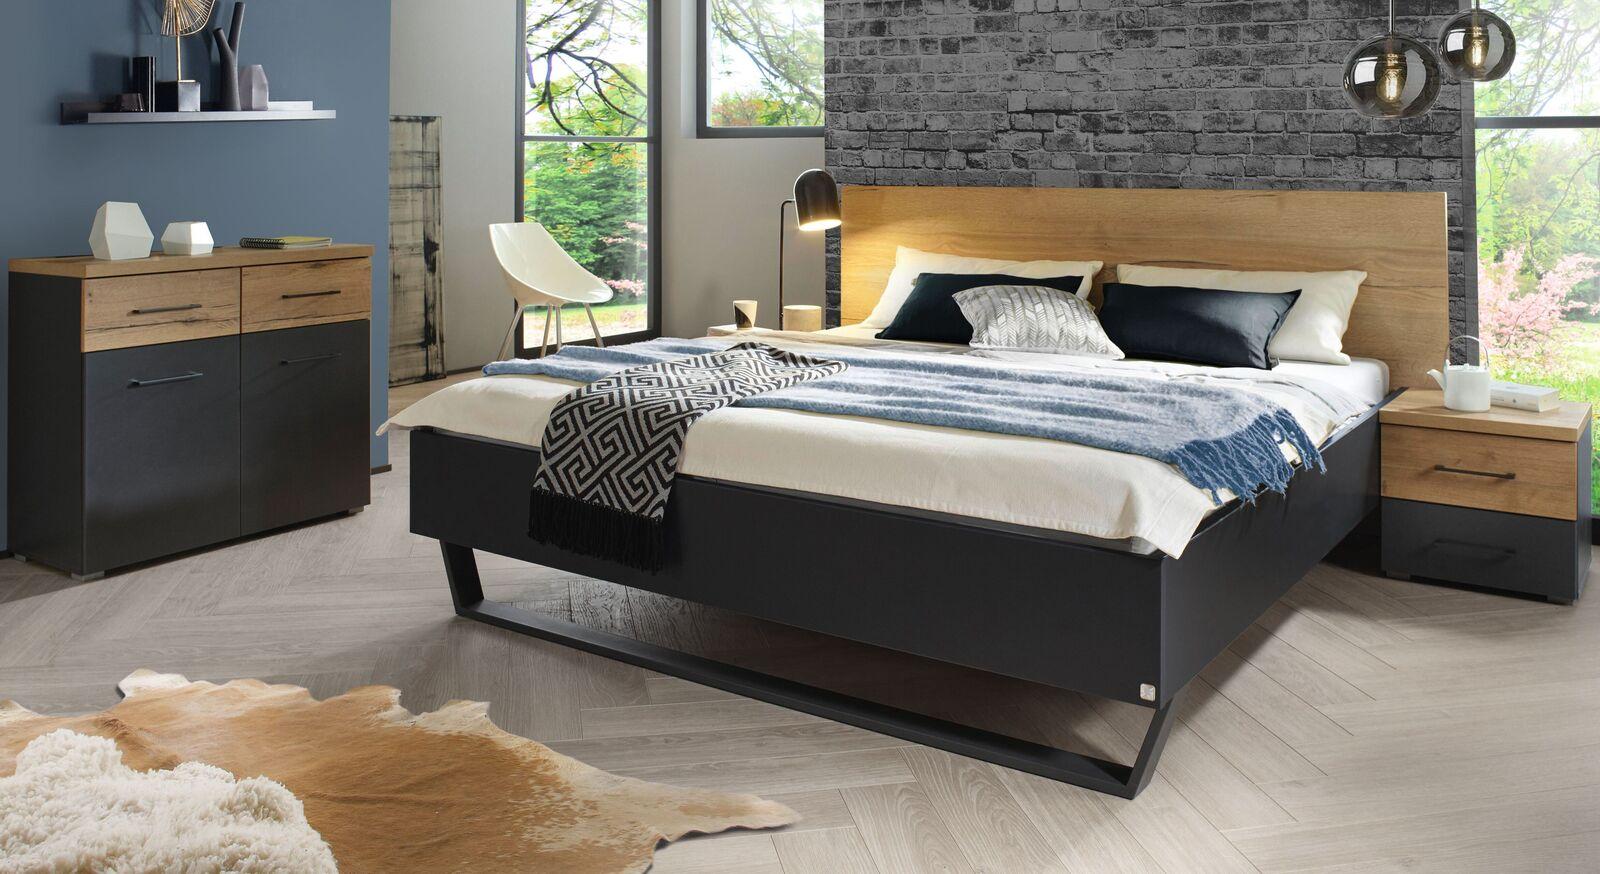 Bett Azula mit passenden Beimöbeln